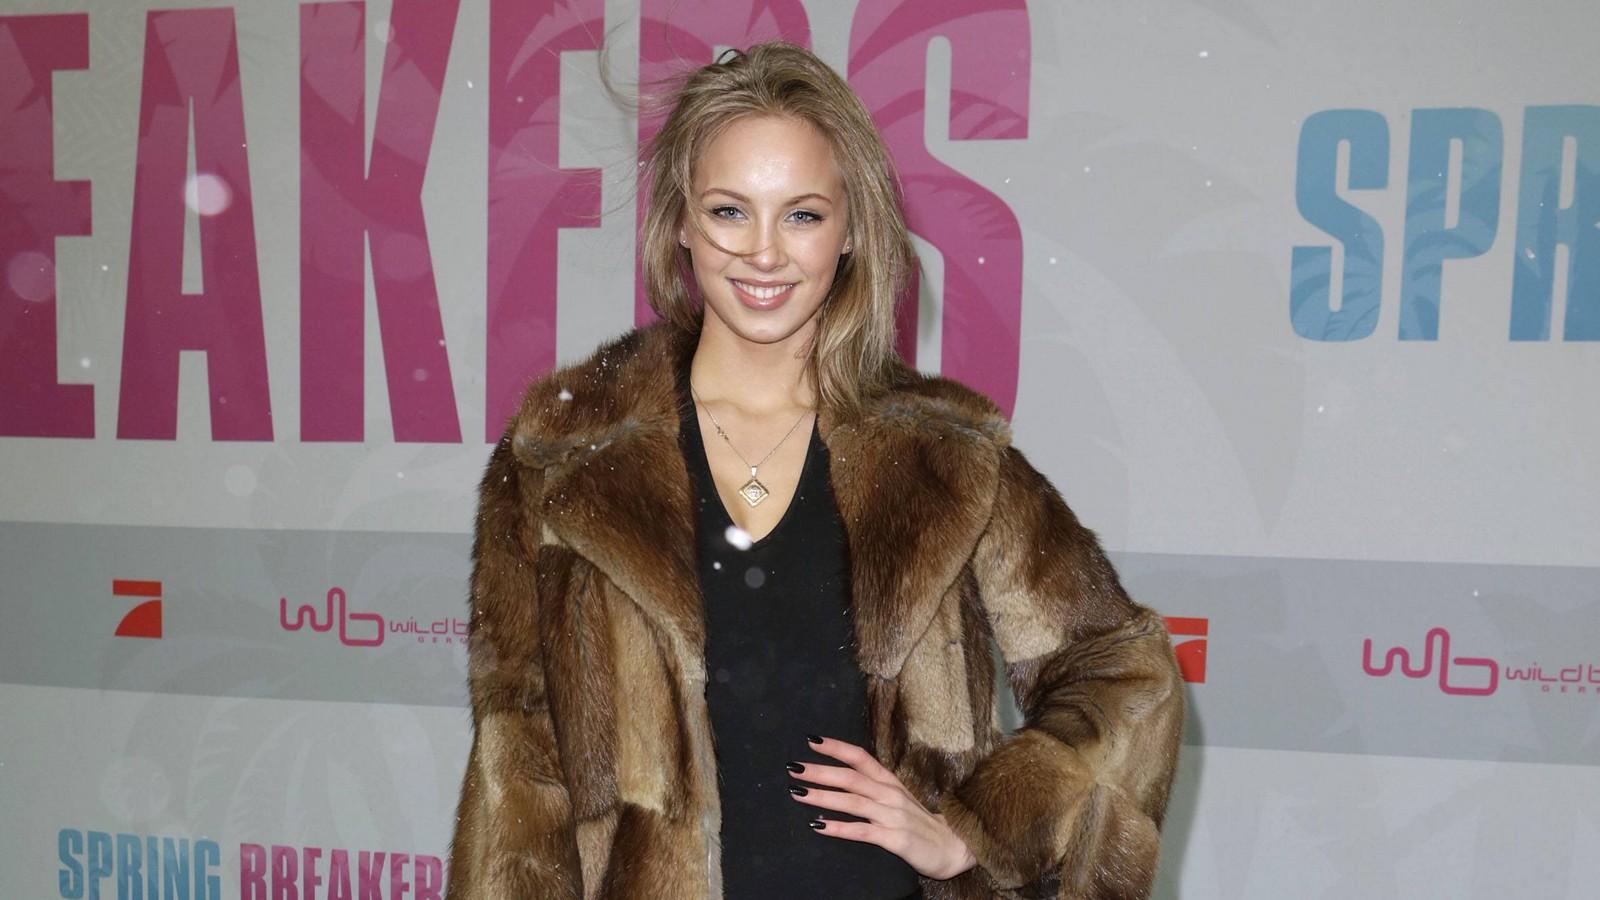 Kasia Lenhard